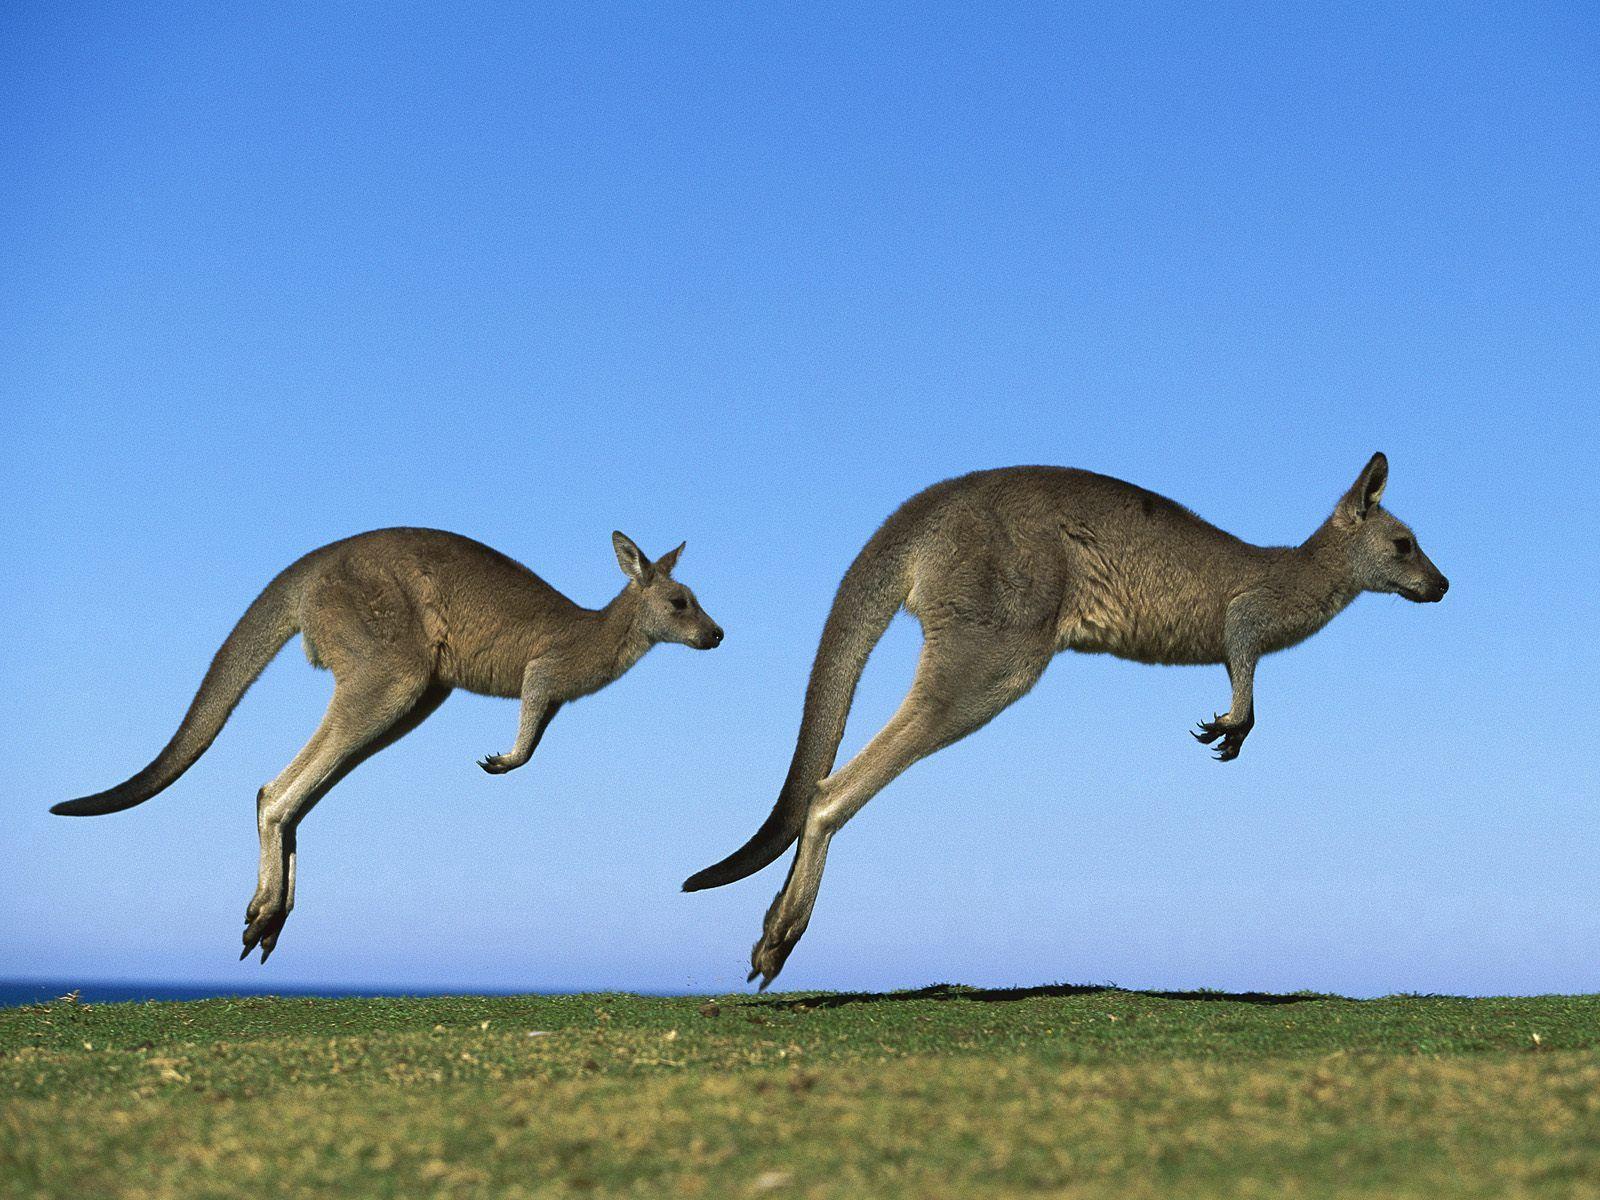 57256 Hintergrundbild herunterladen Tiere, Grass, Sky, Kangaroo, Paar, Feld, Prallen, Springen - Bildschirmschoner und Bilder kostenlos